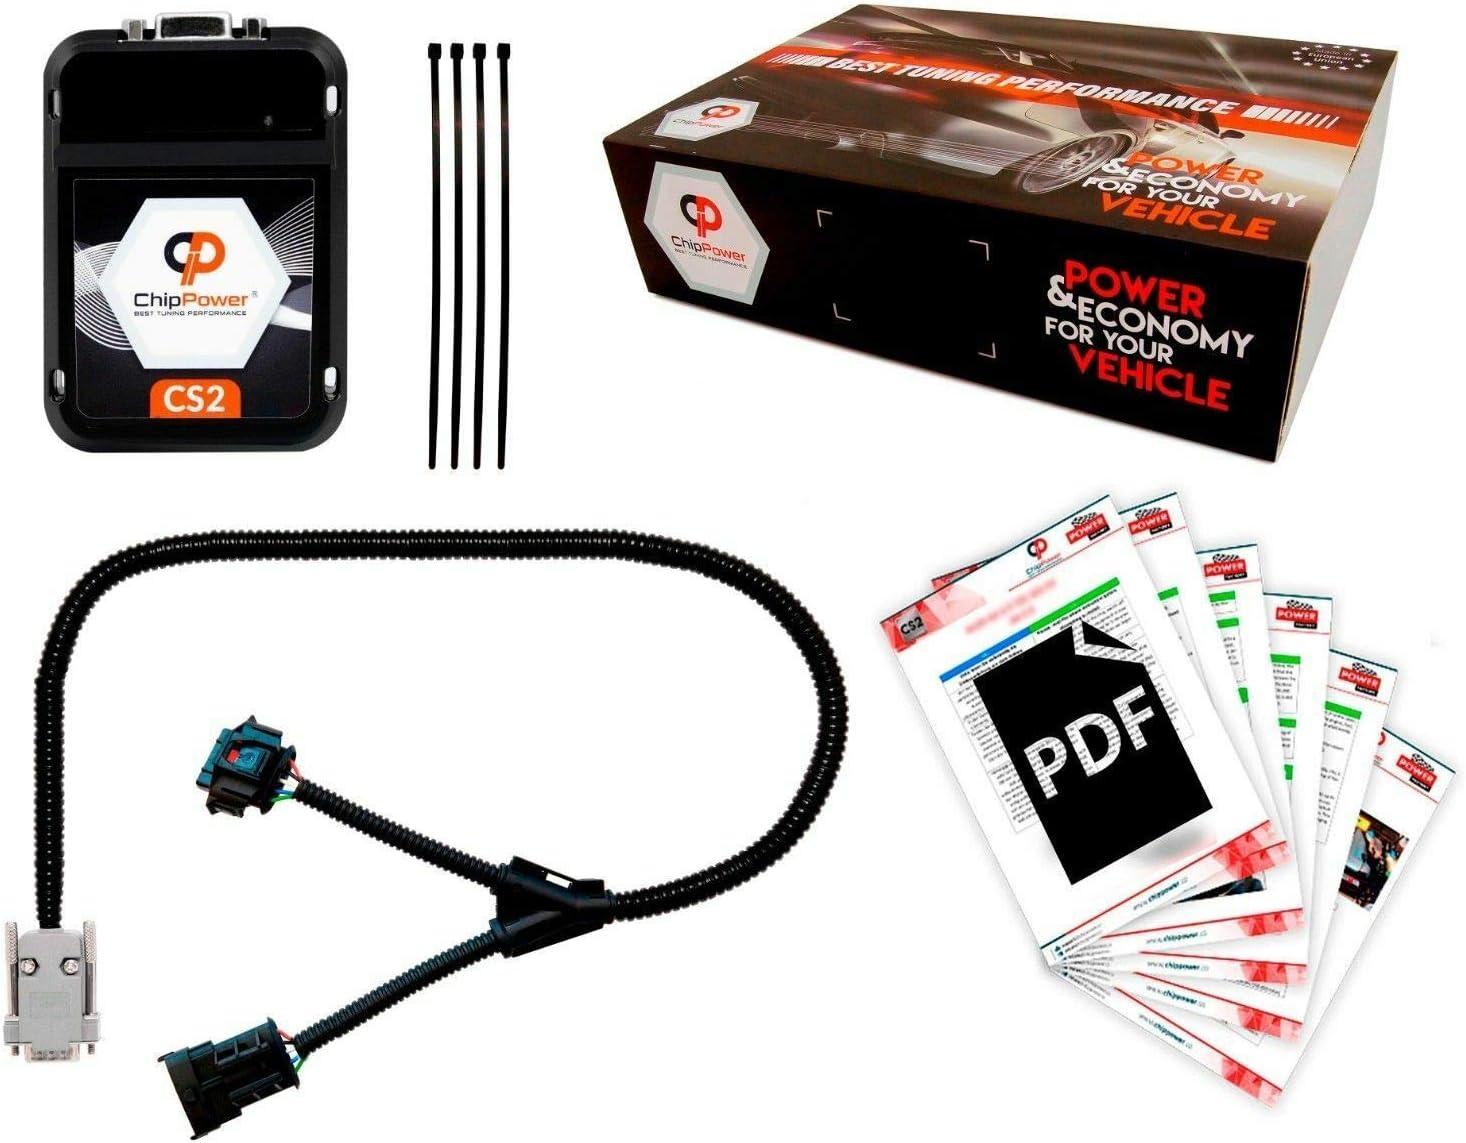 1.6 2.0 FSI 2003-2012 Chip TuningBox Benzin Chiptuning ChipPower CS2 f/ür A3 8P